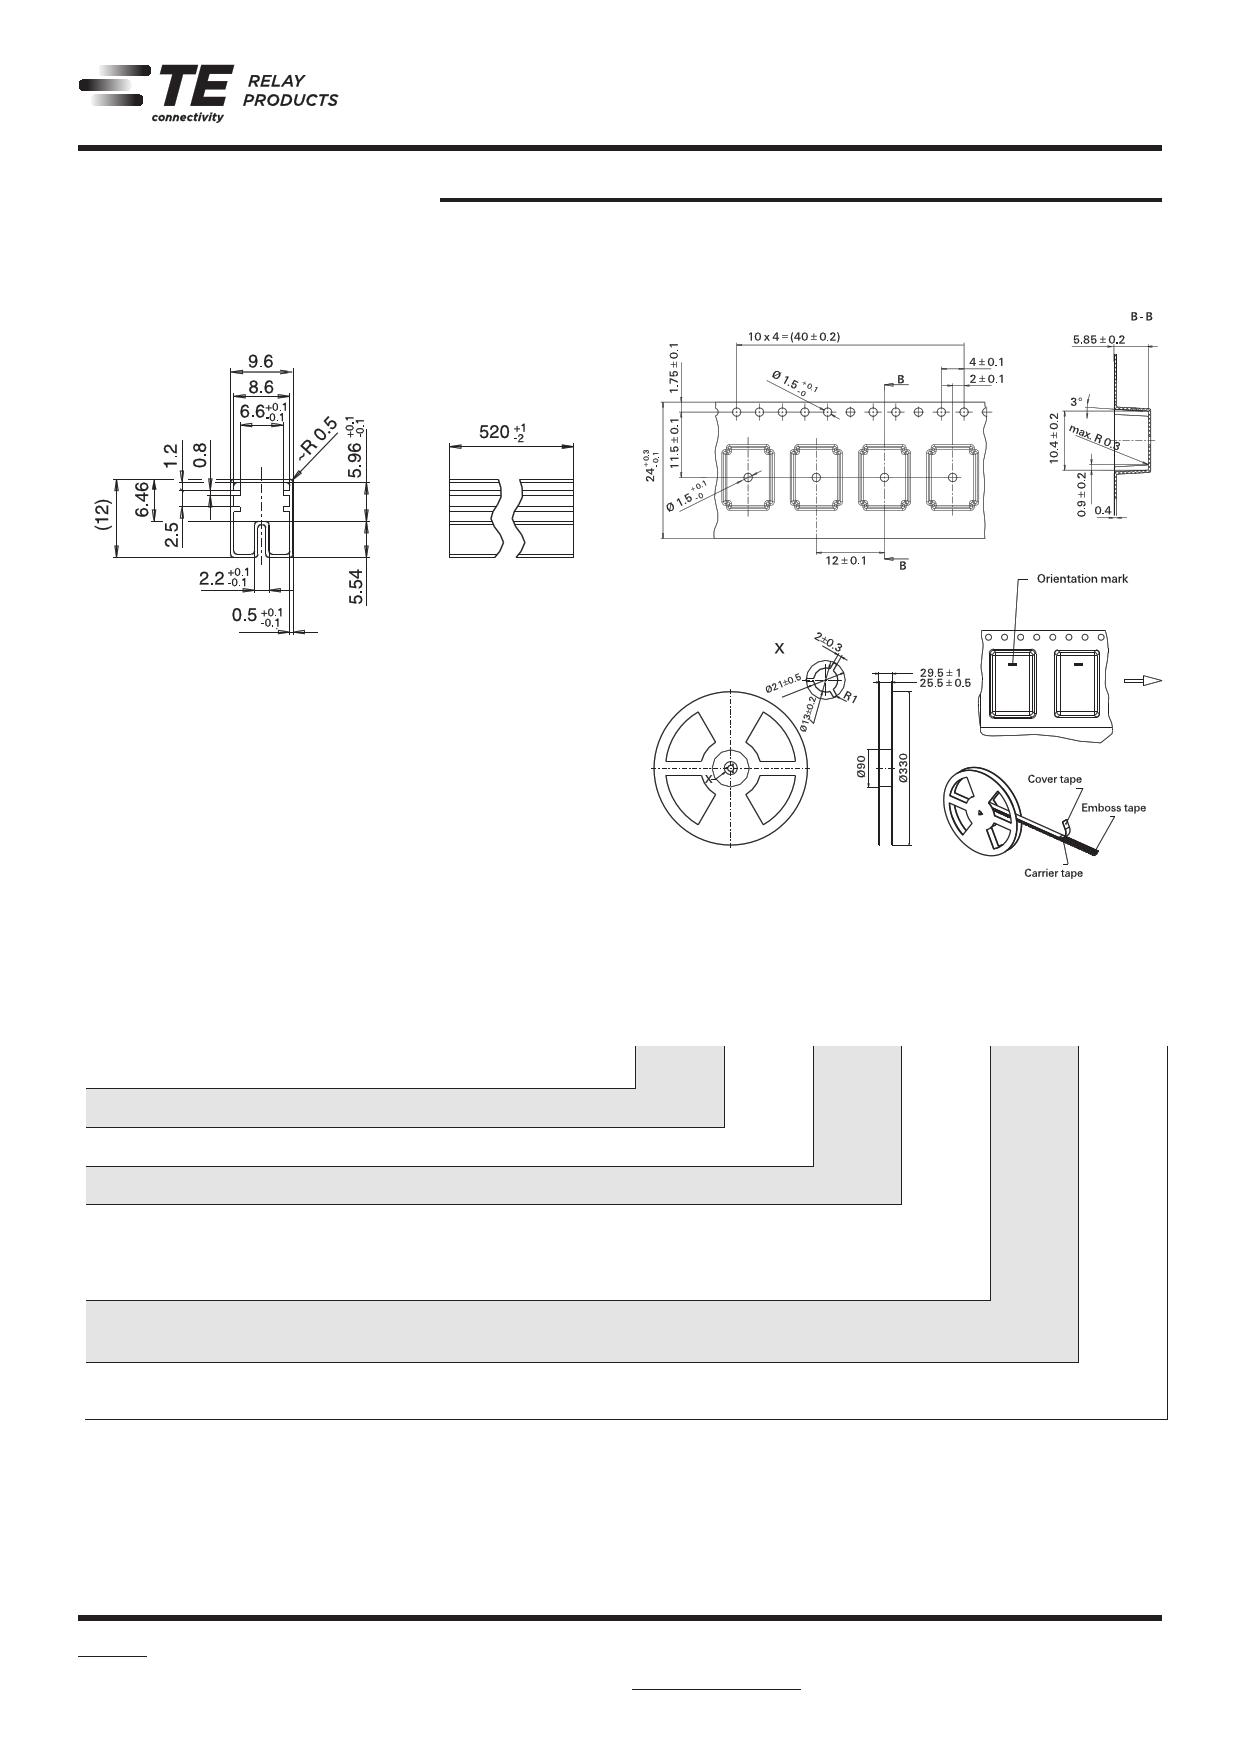 6-1462039-0 pdf, 반도체, 판매, 대치품